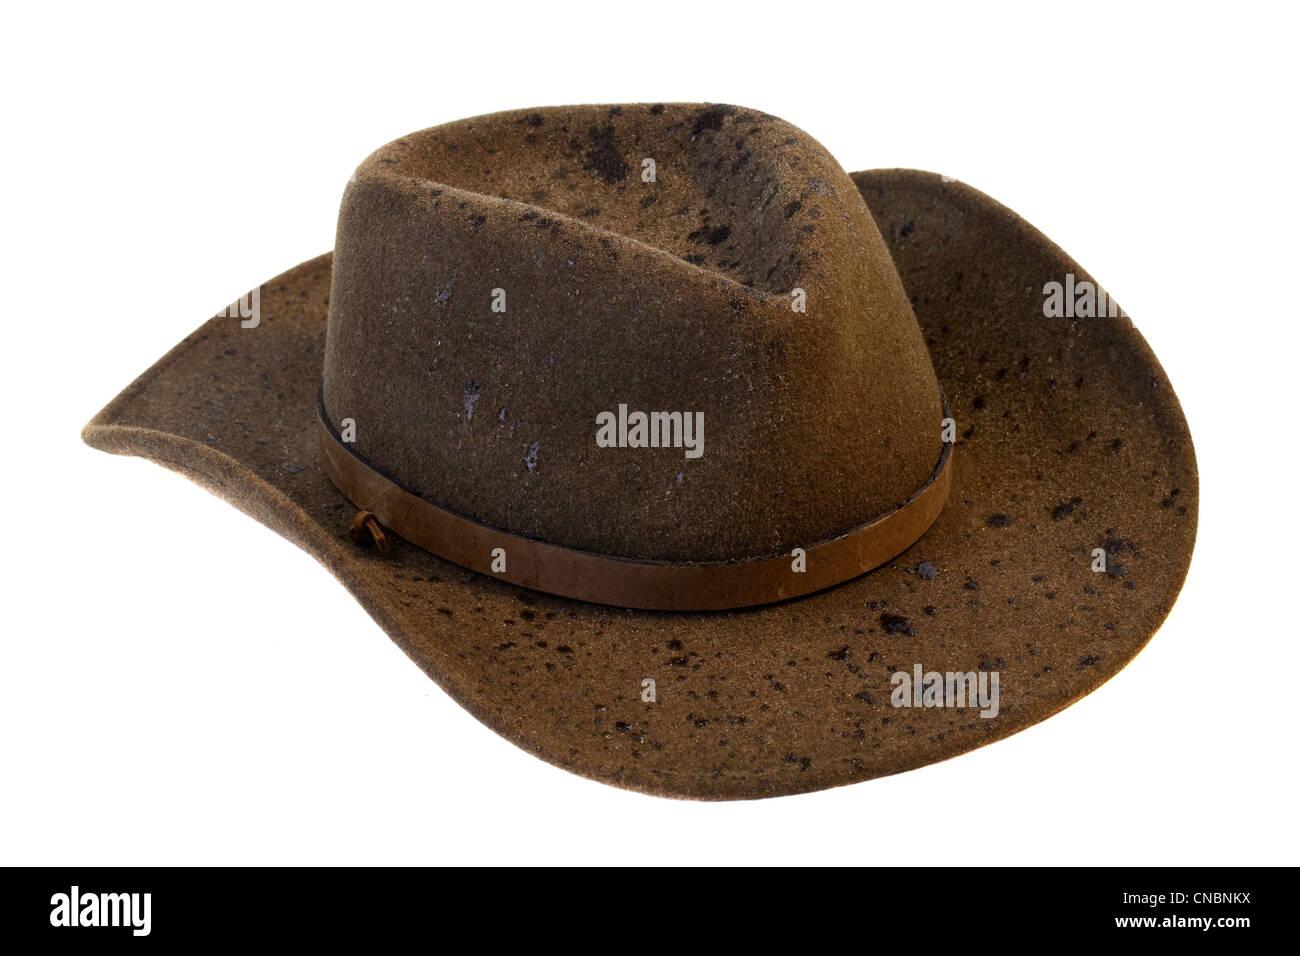 ec9bbd9cb2 Fieltro de lana marrón sombrero de cowboy con gotas de lluvia aislado sobre  fondo blanco.